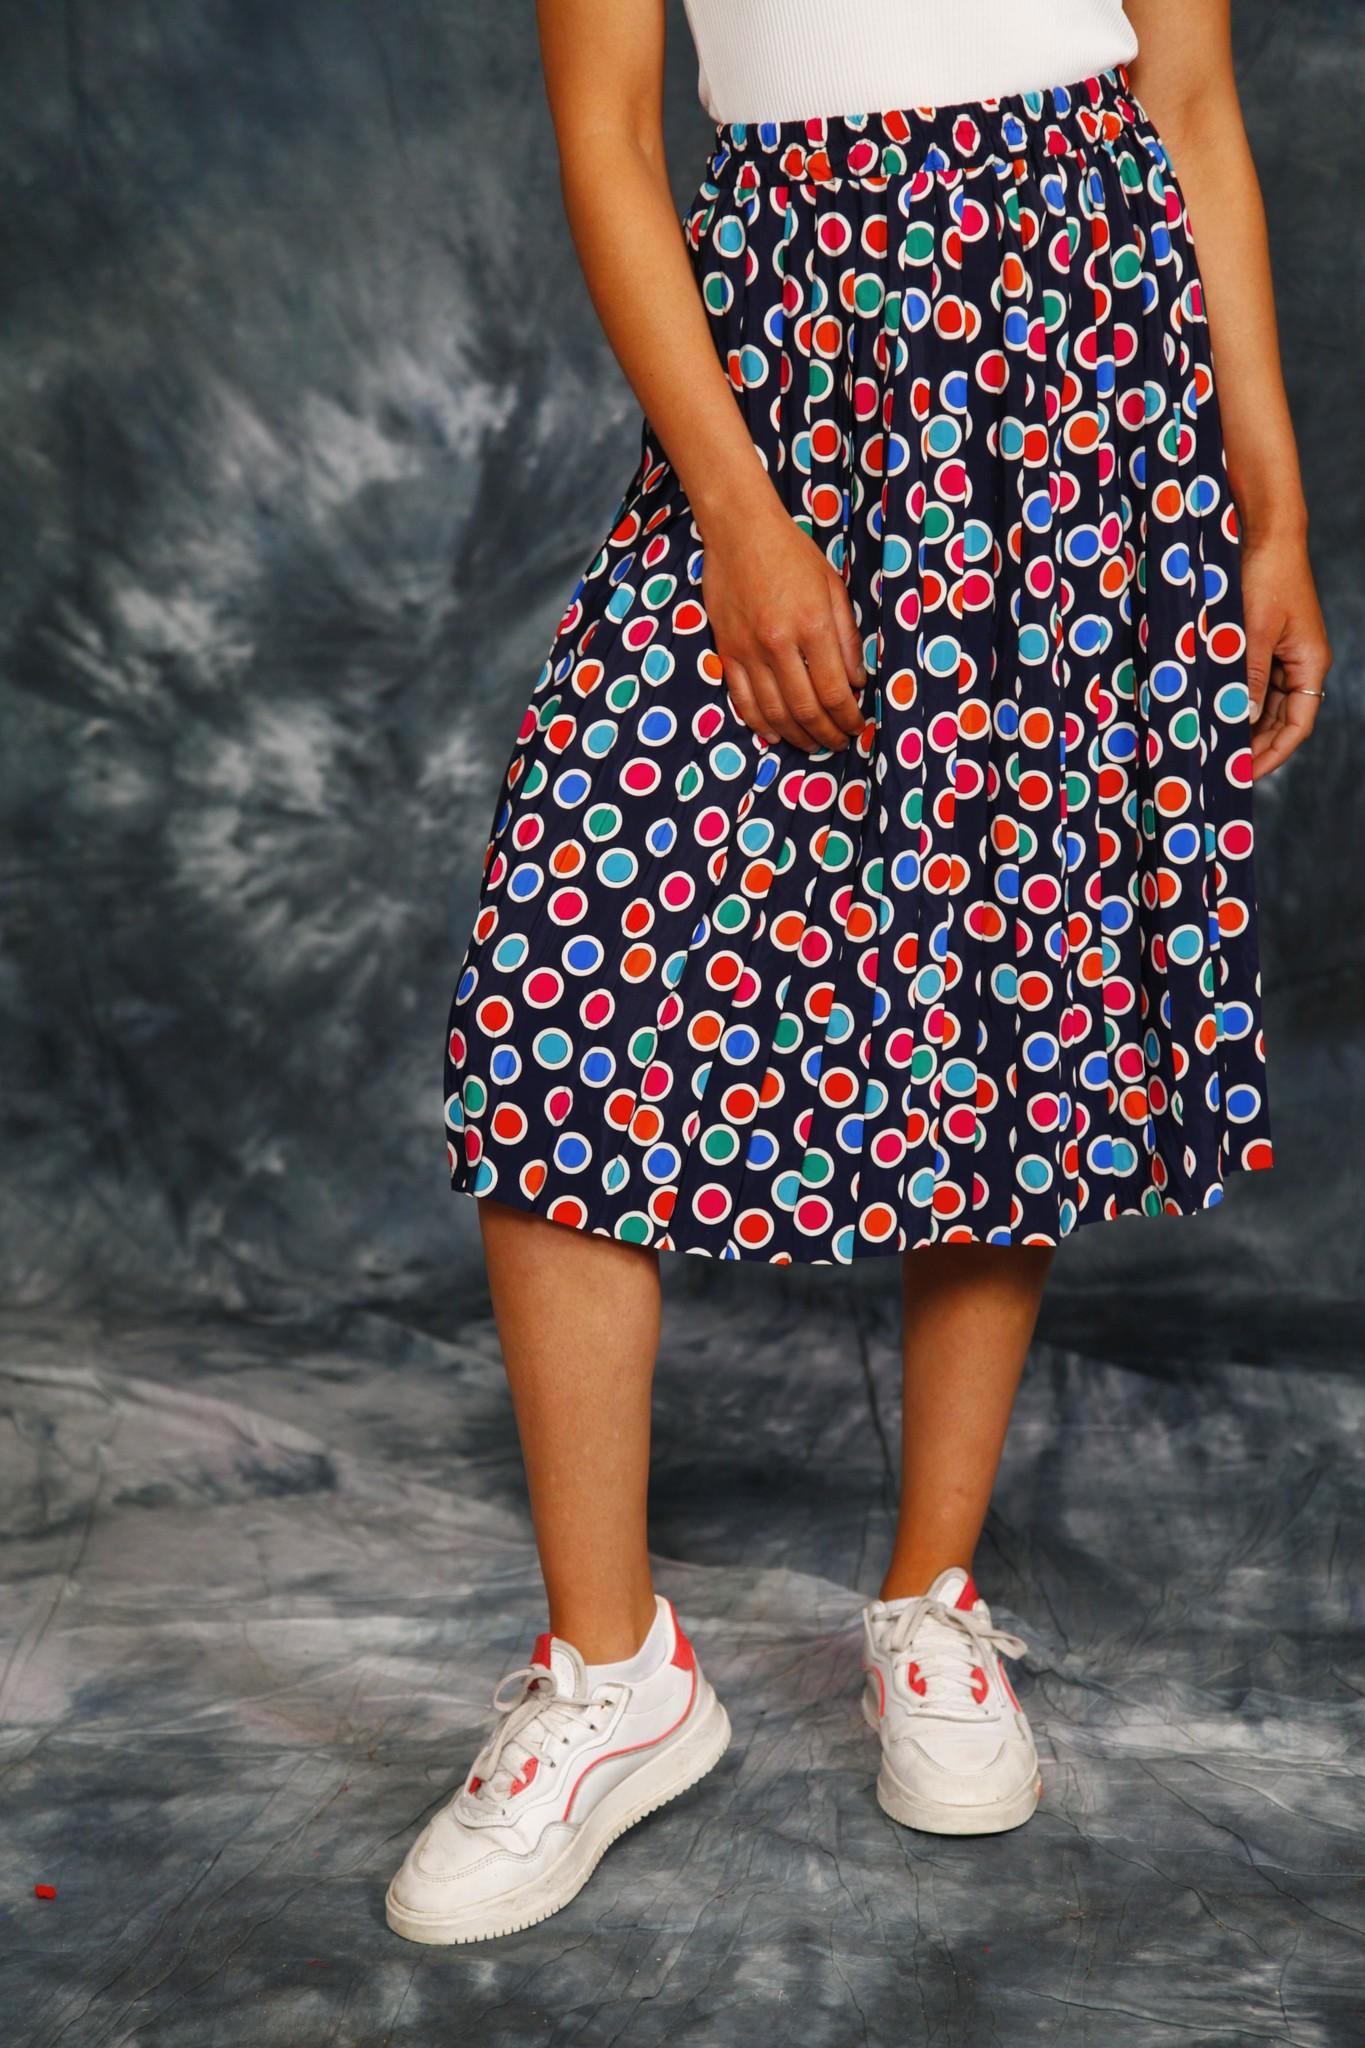 Pleated 80s skirt